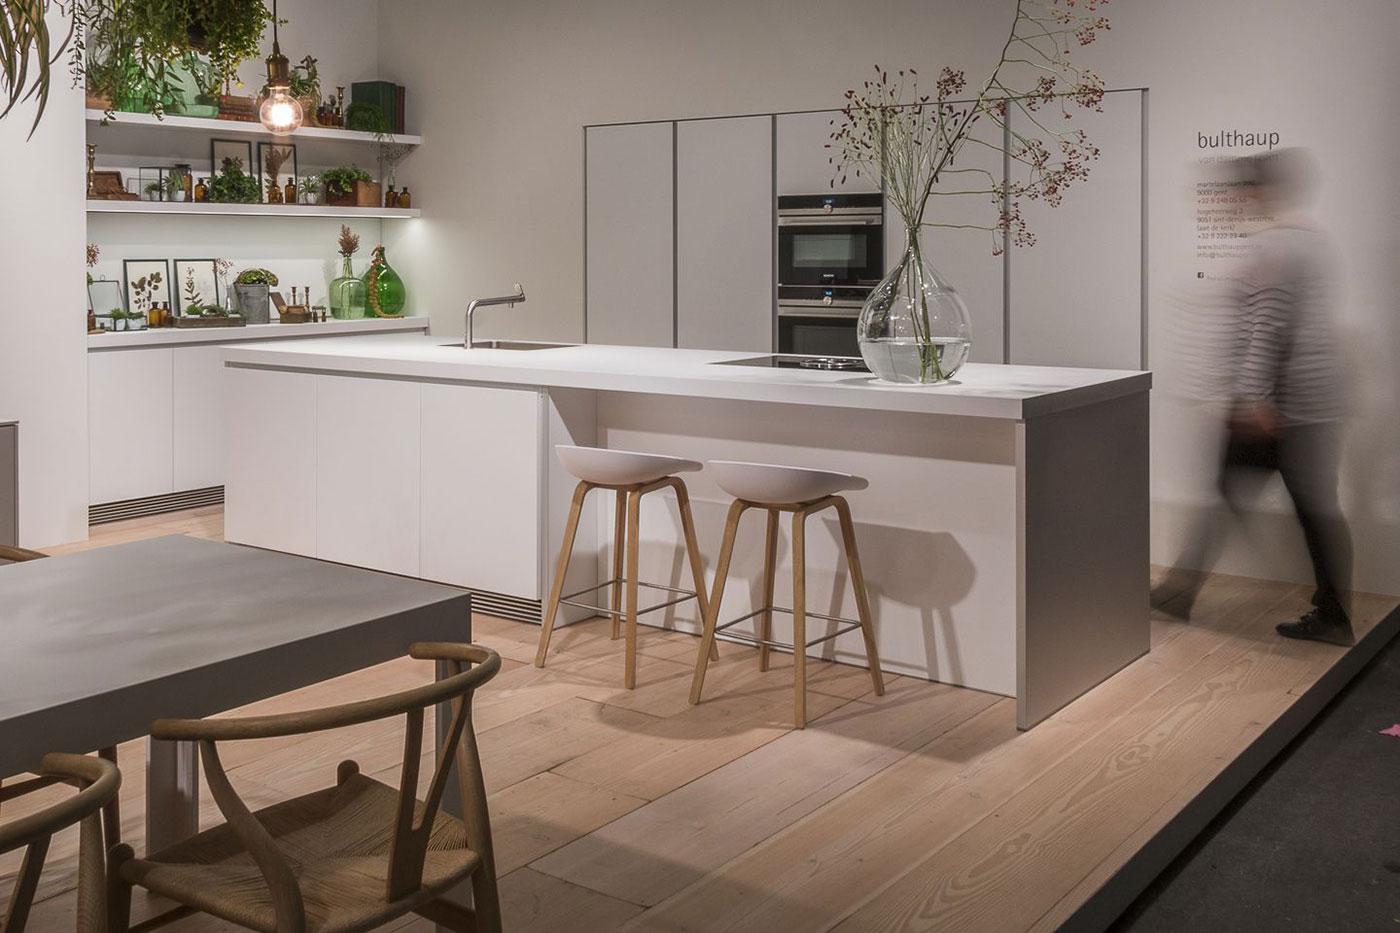 Obegi-Home-Bulthaup-Kitchens-539e6b8b533b9b94297c8a9749695123